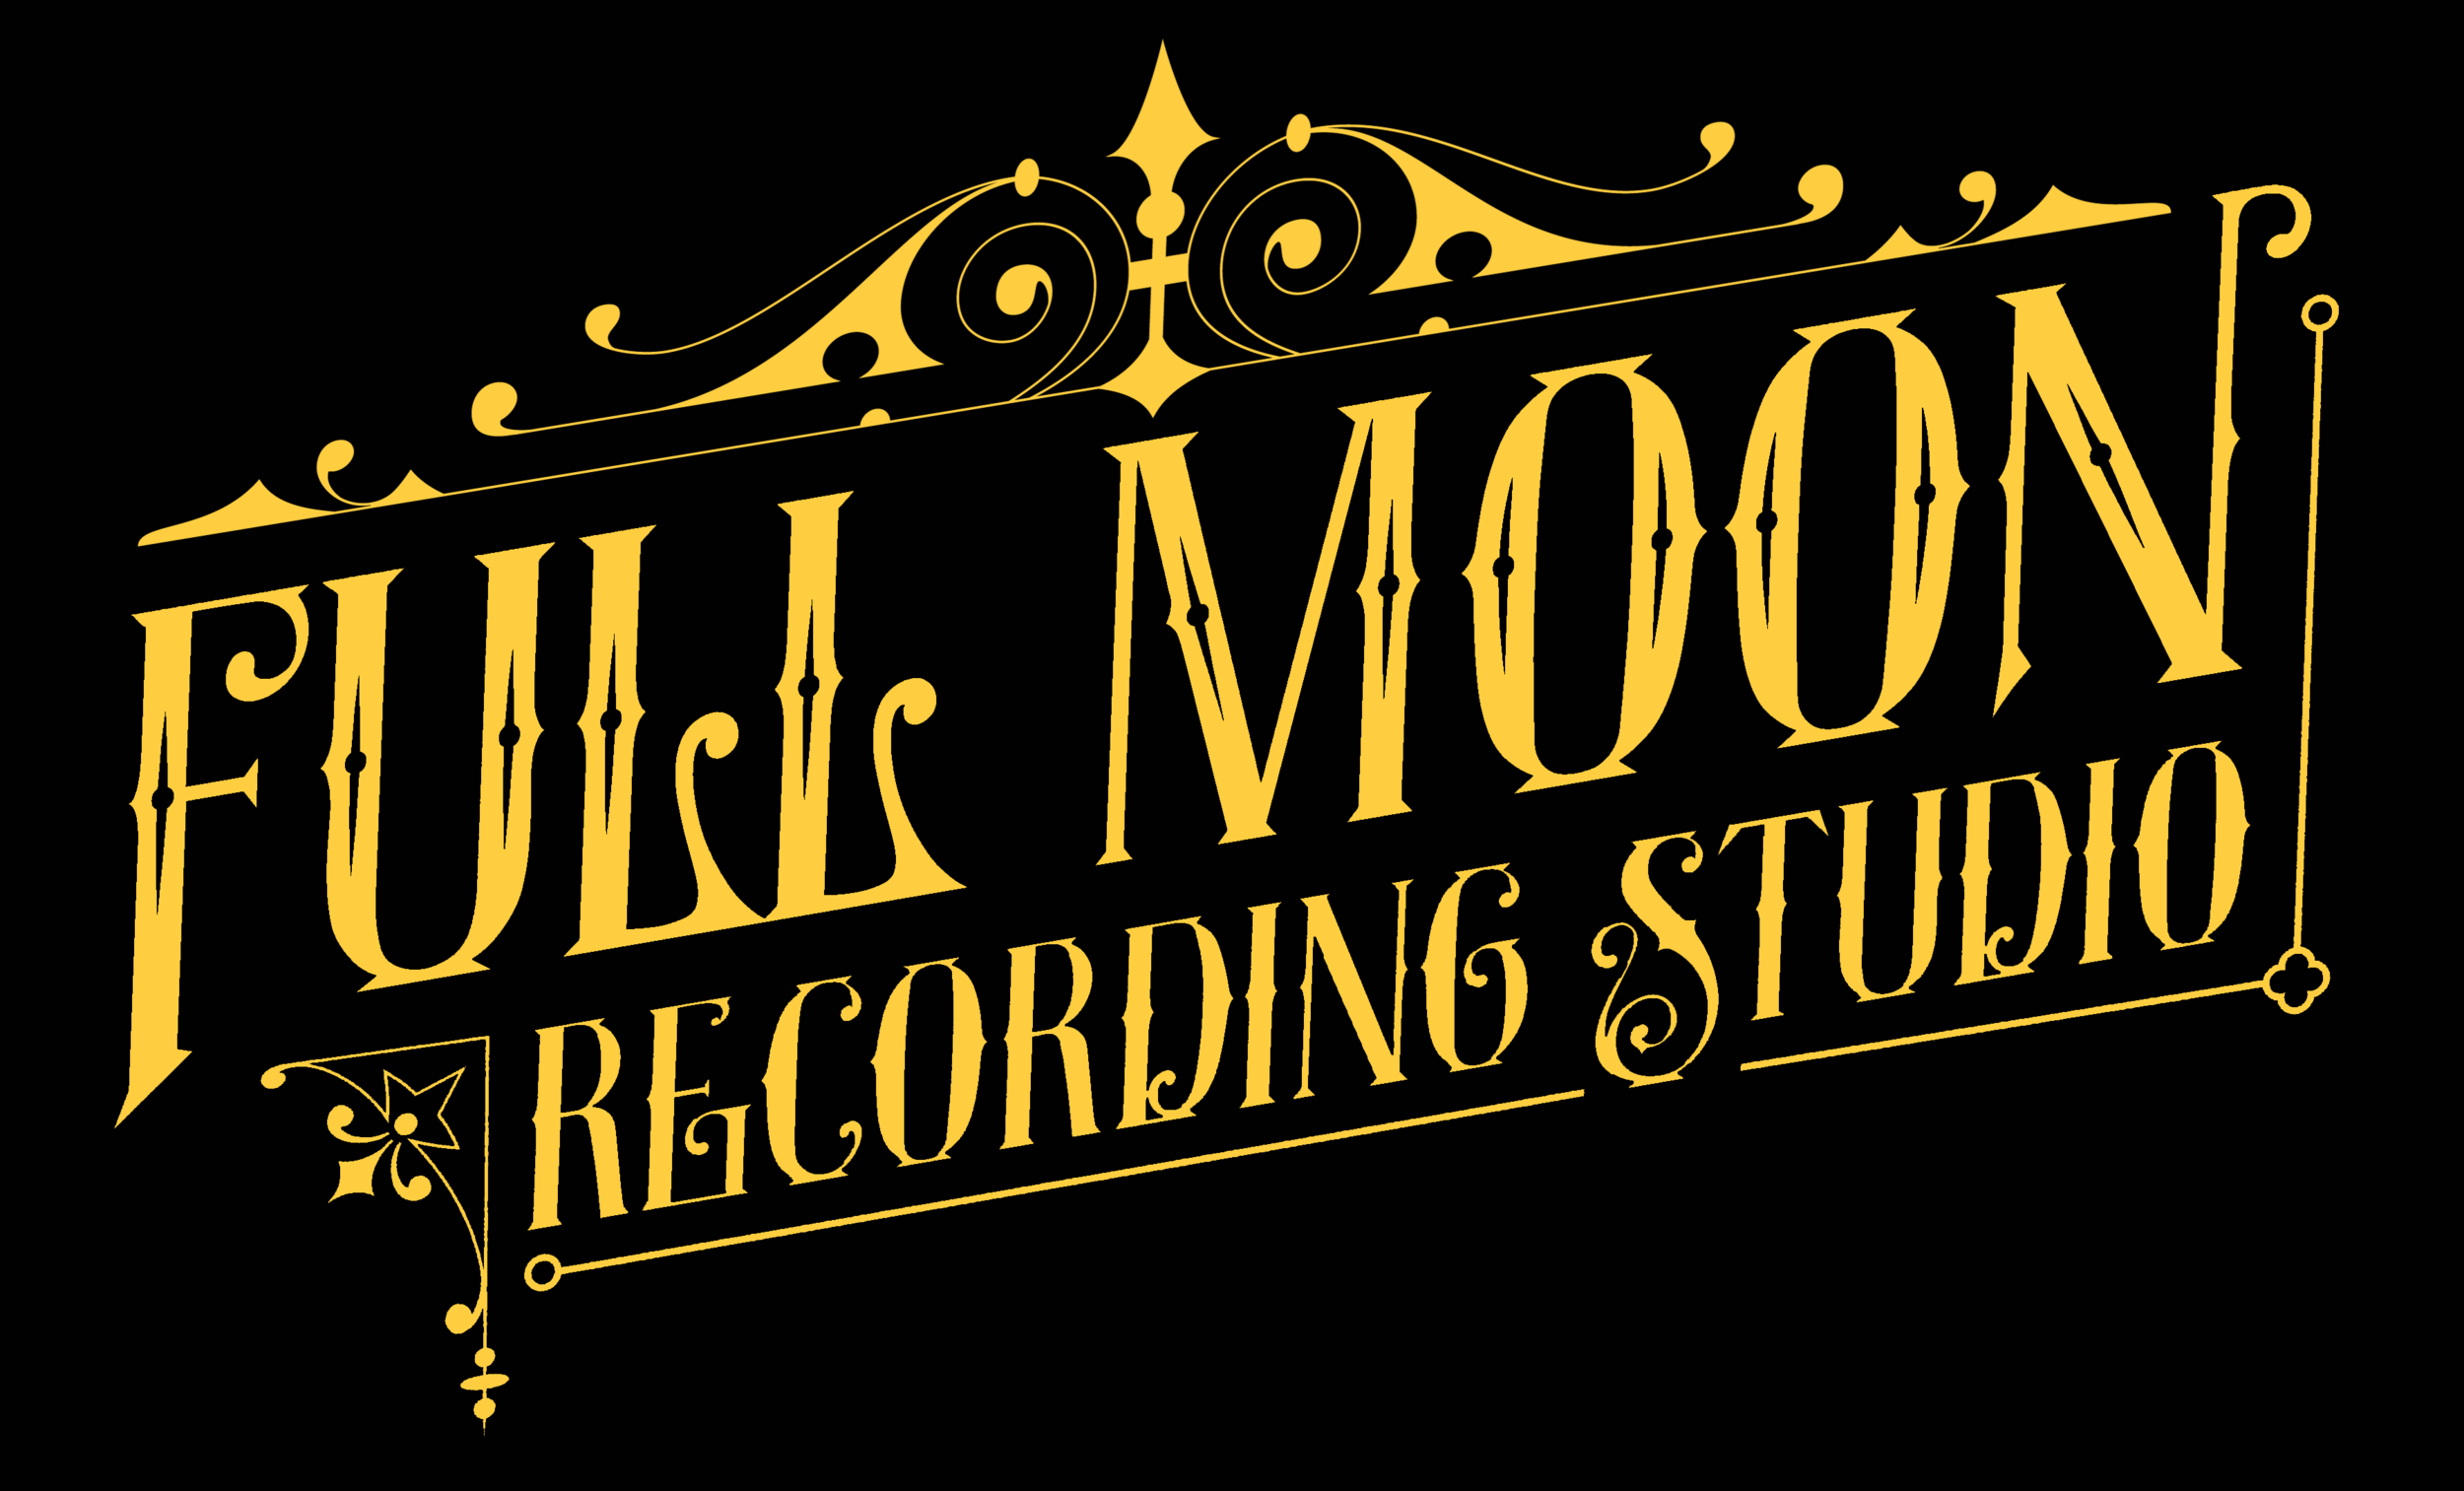 FullMoon_logo_studio_logo_black bgr.png